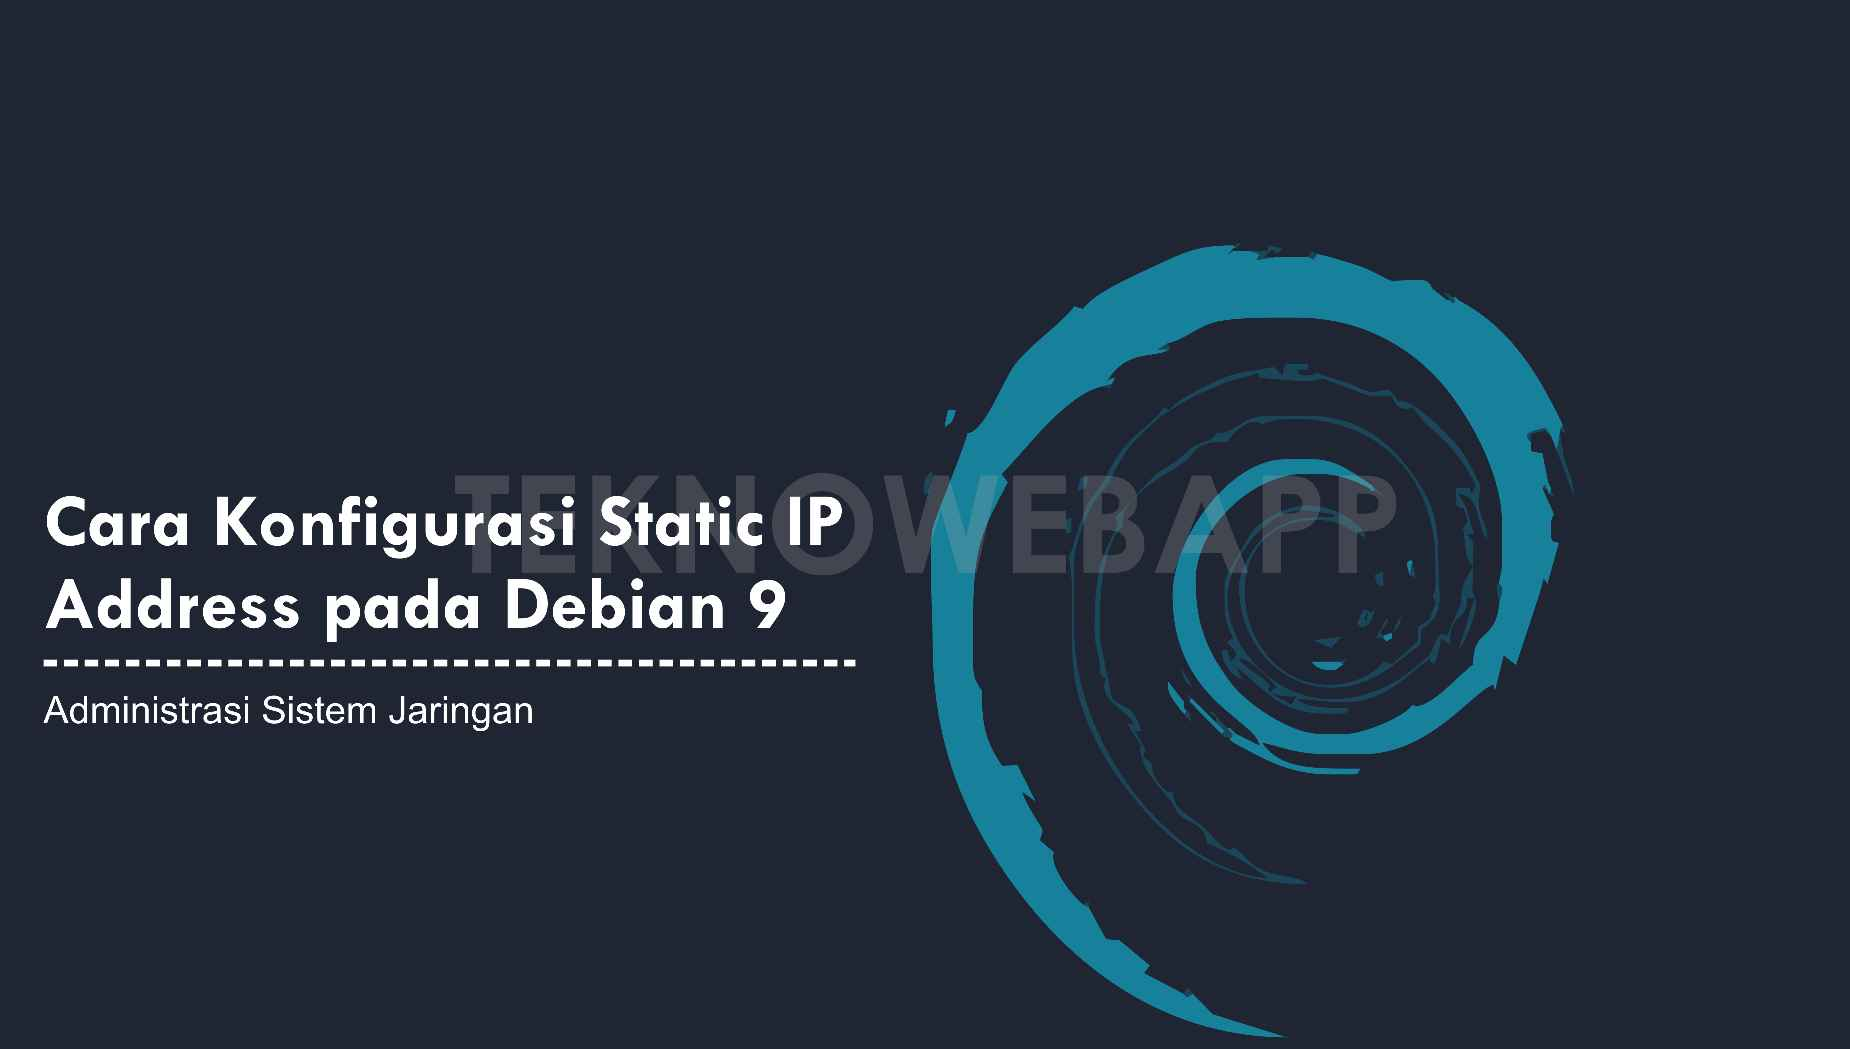 Konfigurasi Static IP Address pada Debian 9